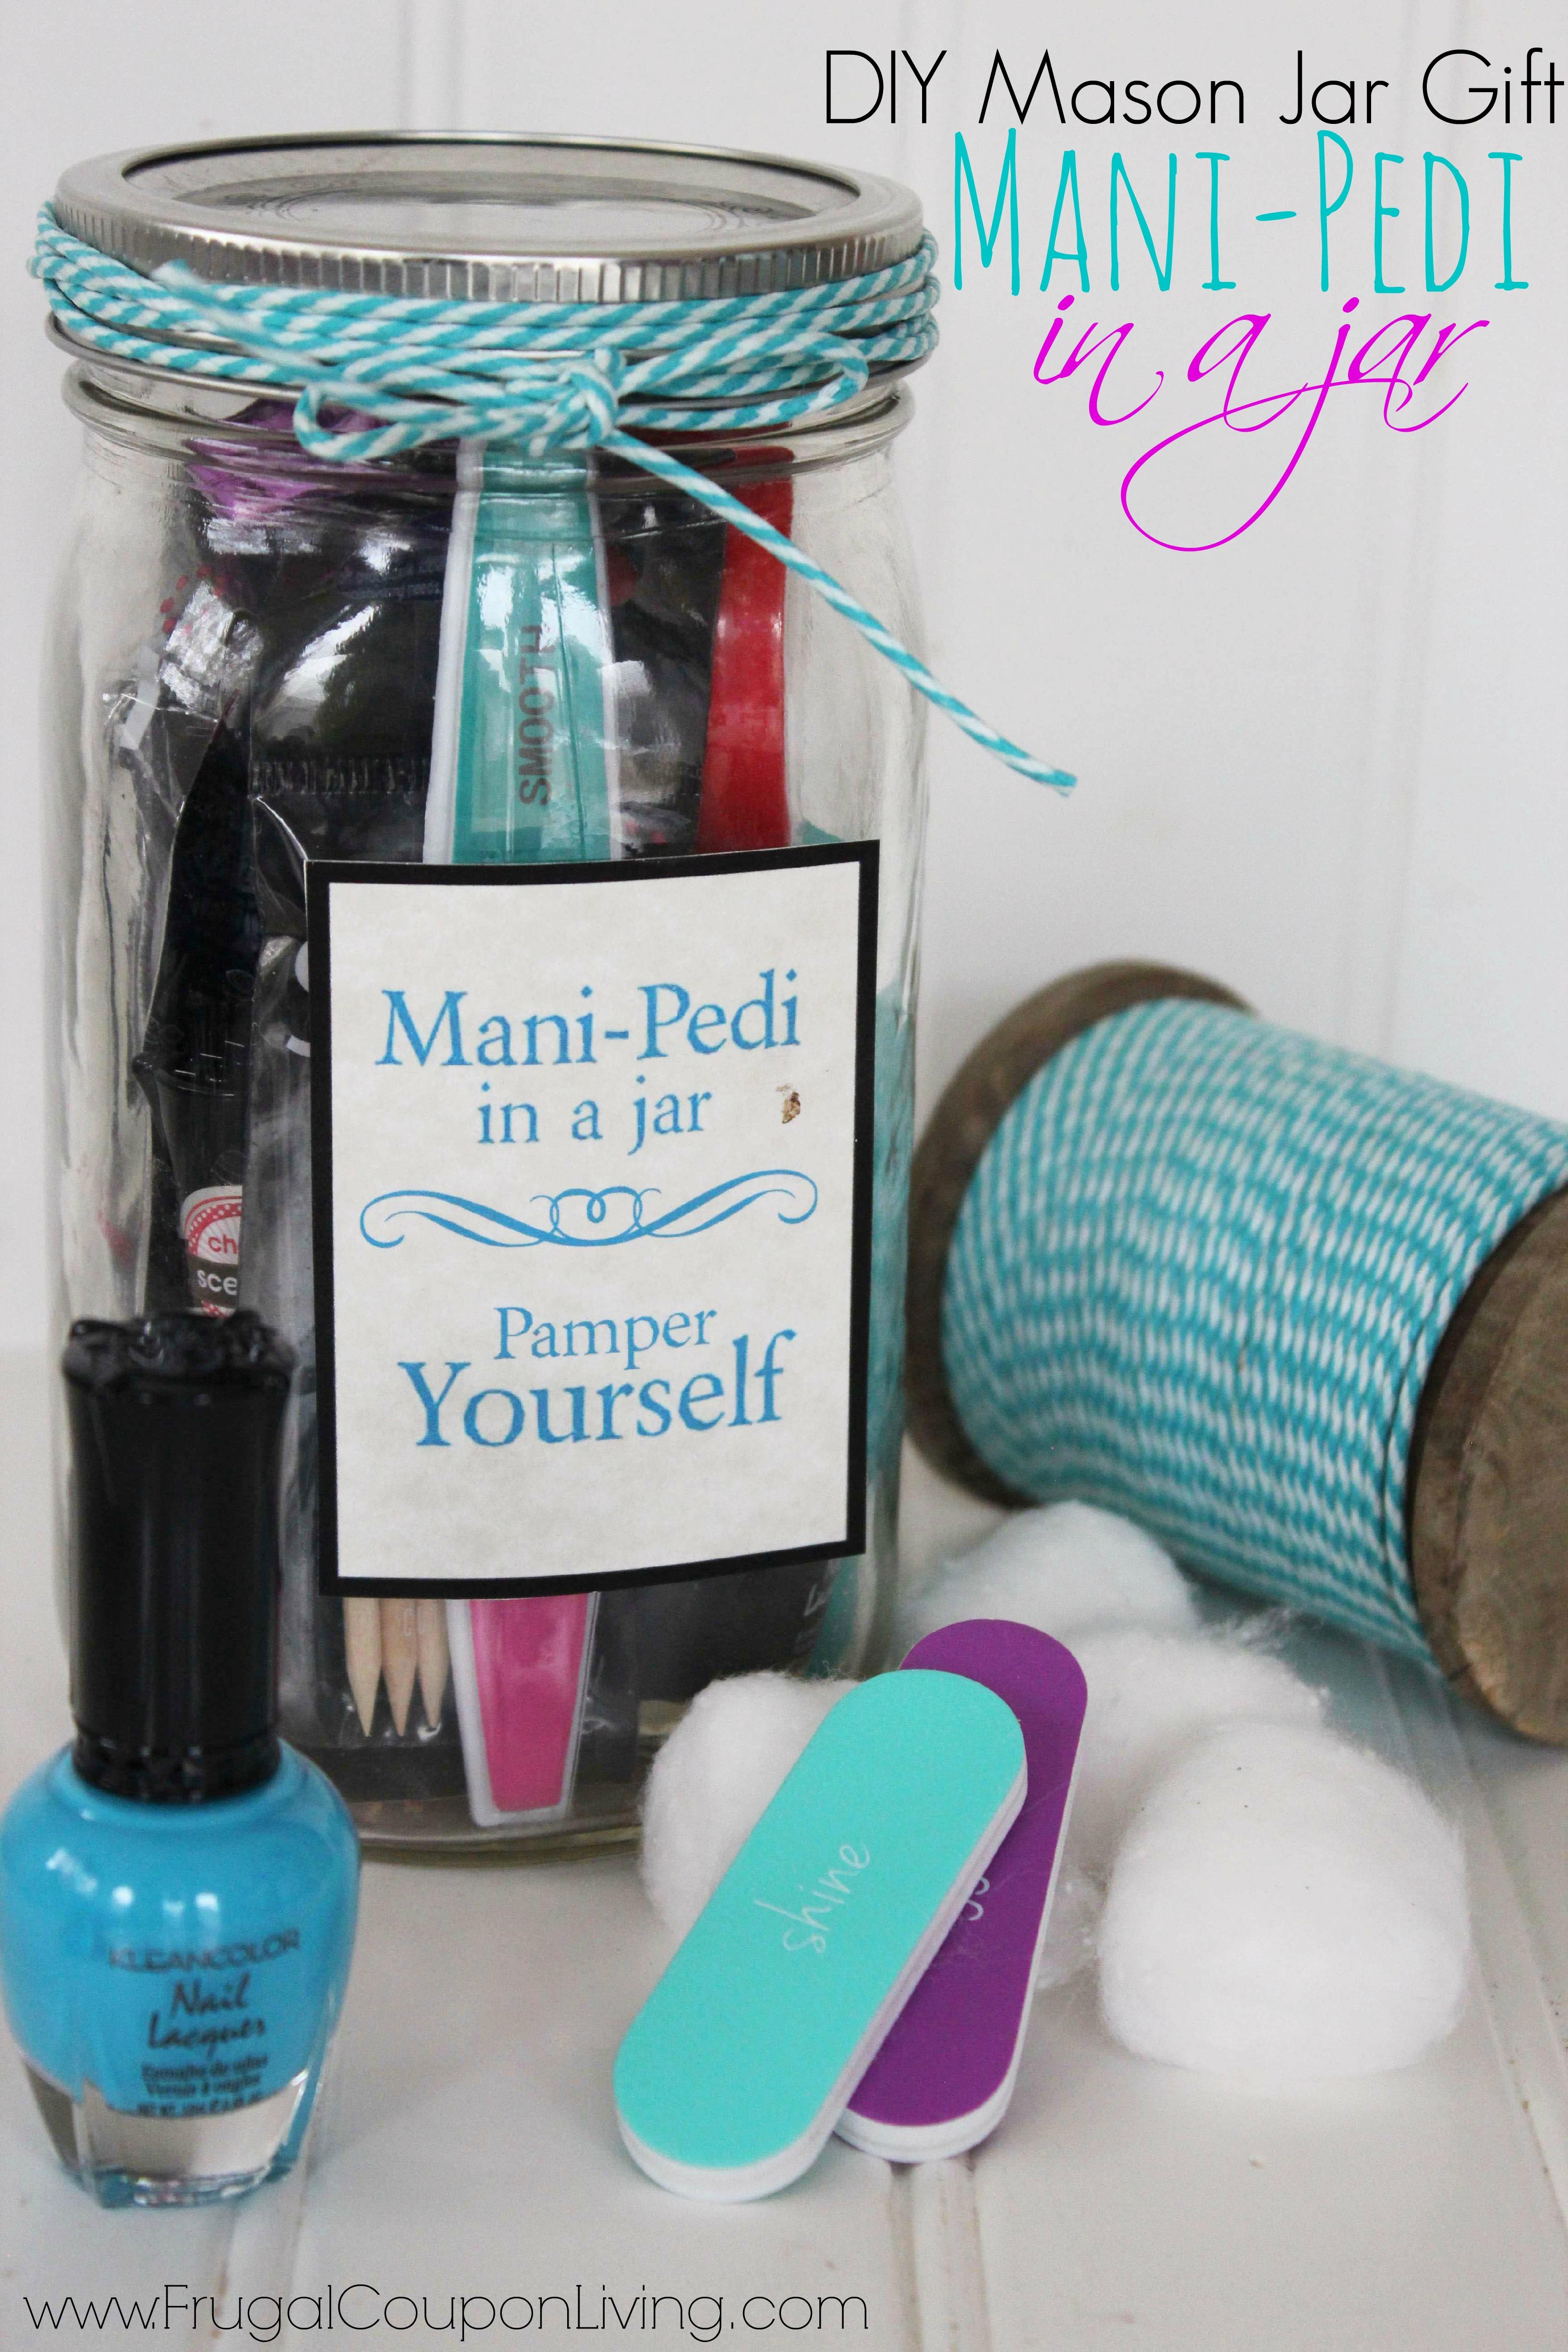 mani-pedi-in-a-jar-frugal-coupon-living